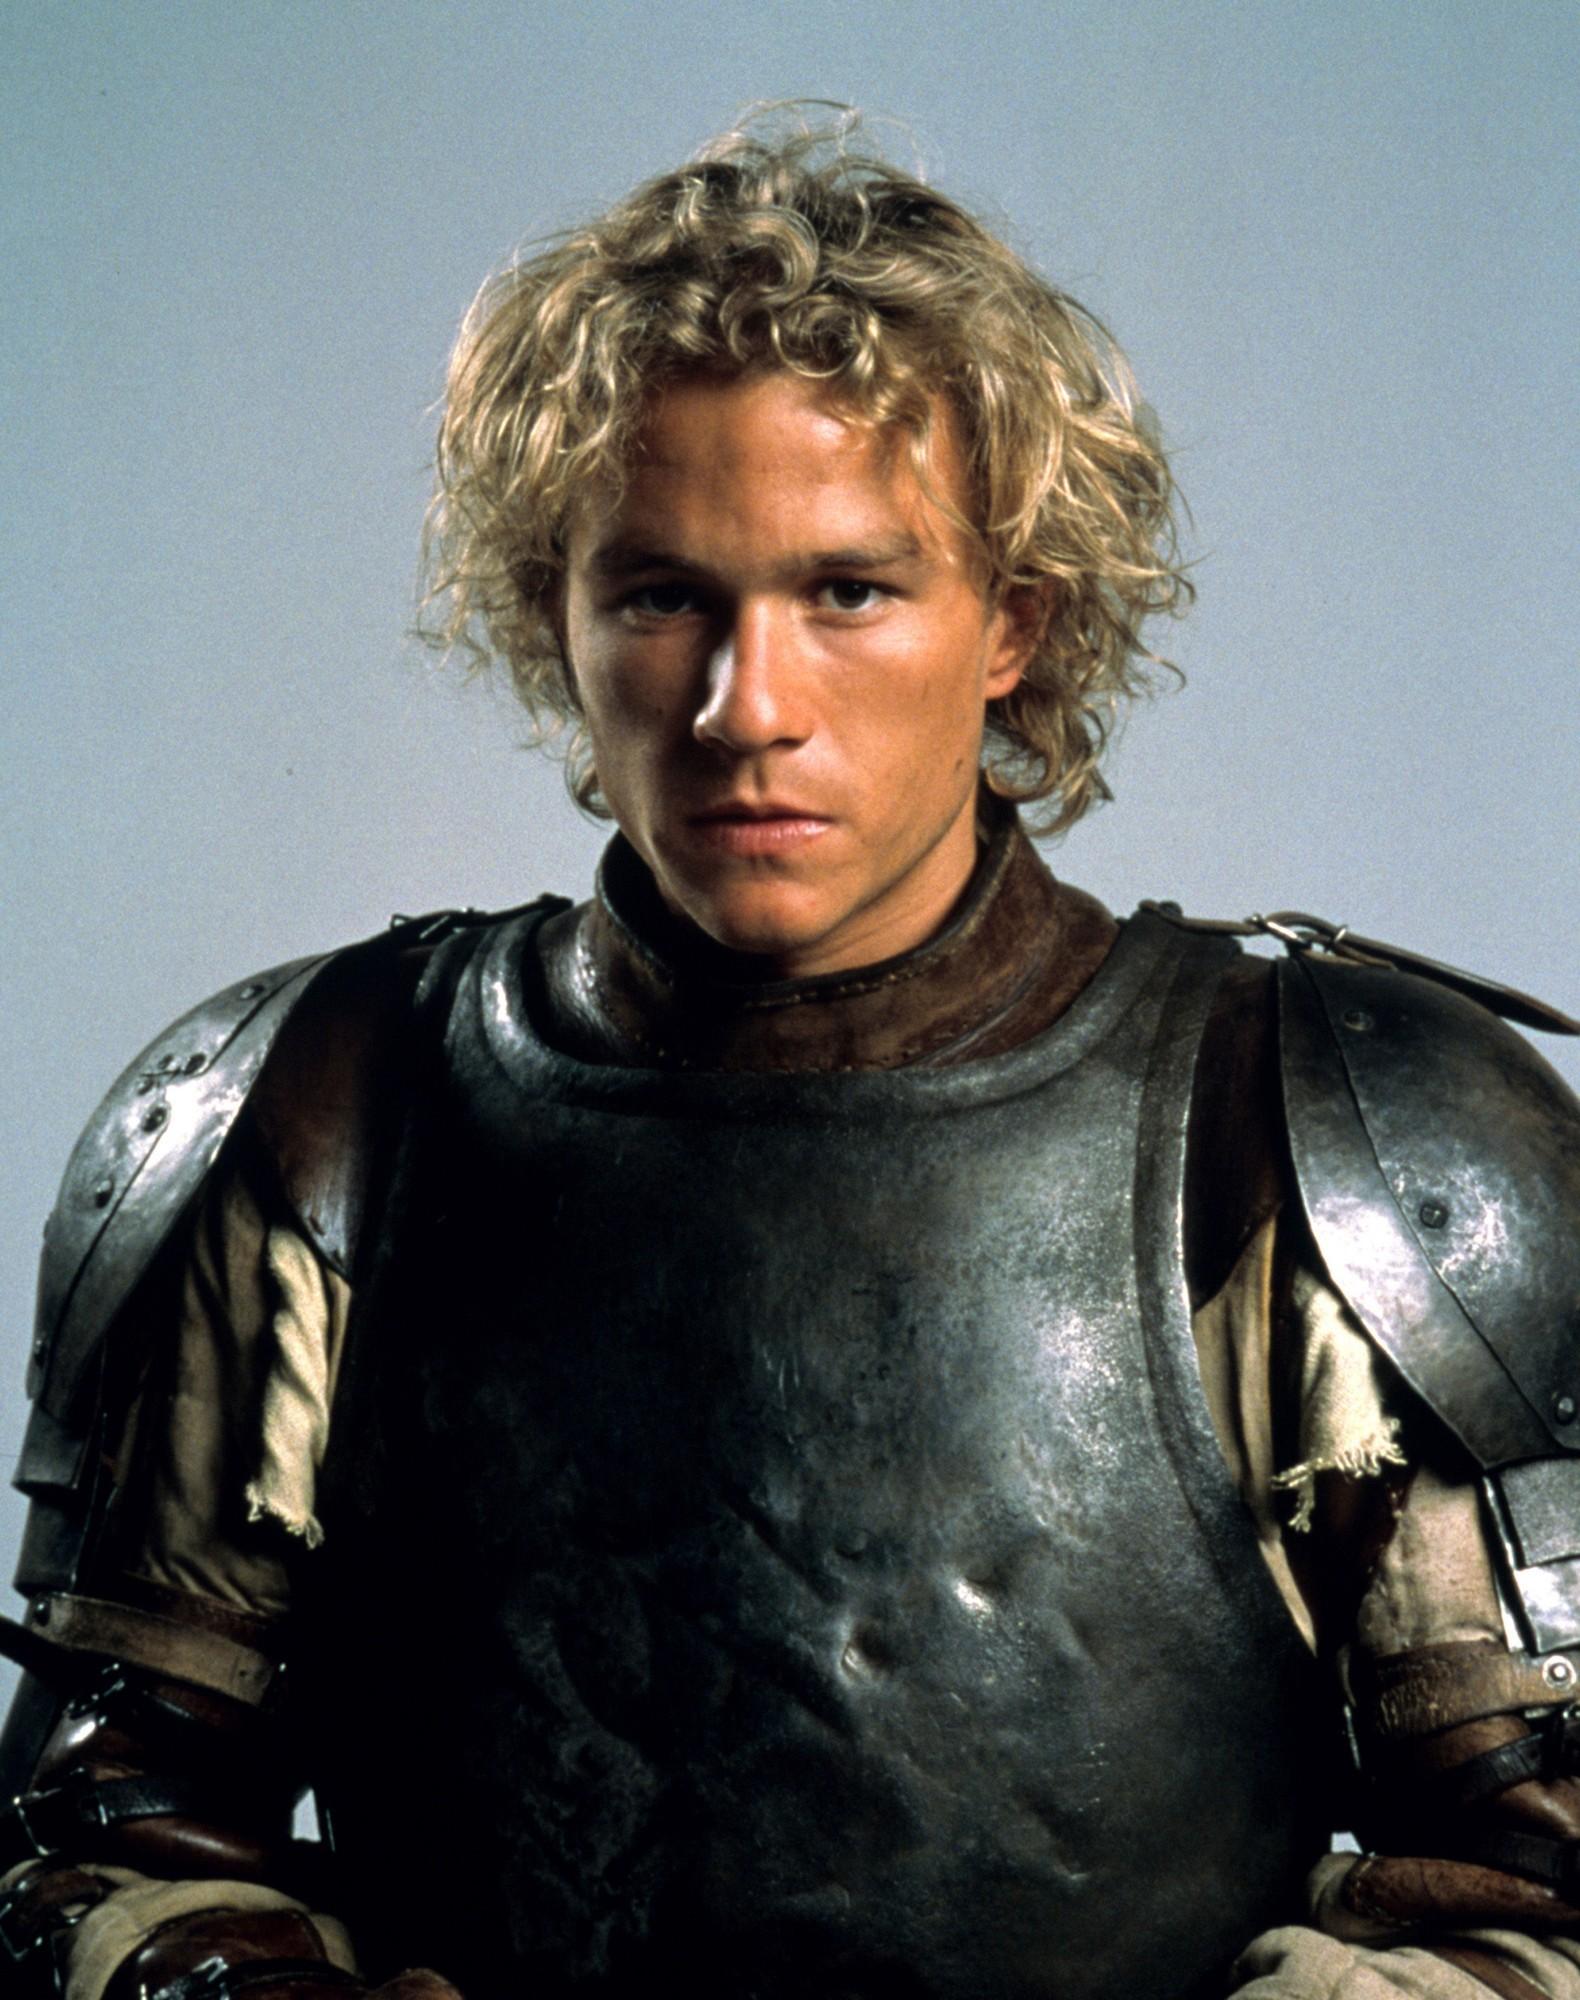 Heath Ledger Promo Shoot - AKT - A Knight's Tale Photo ...